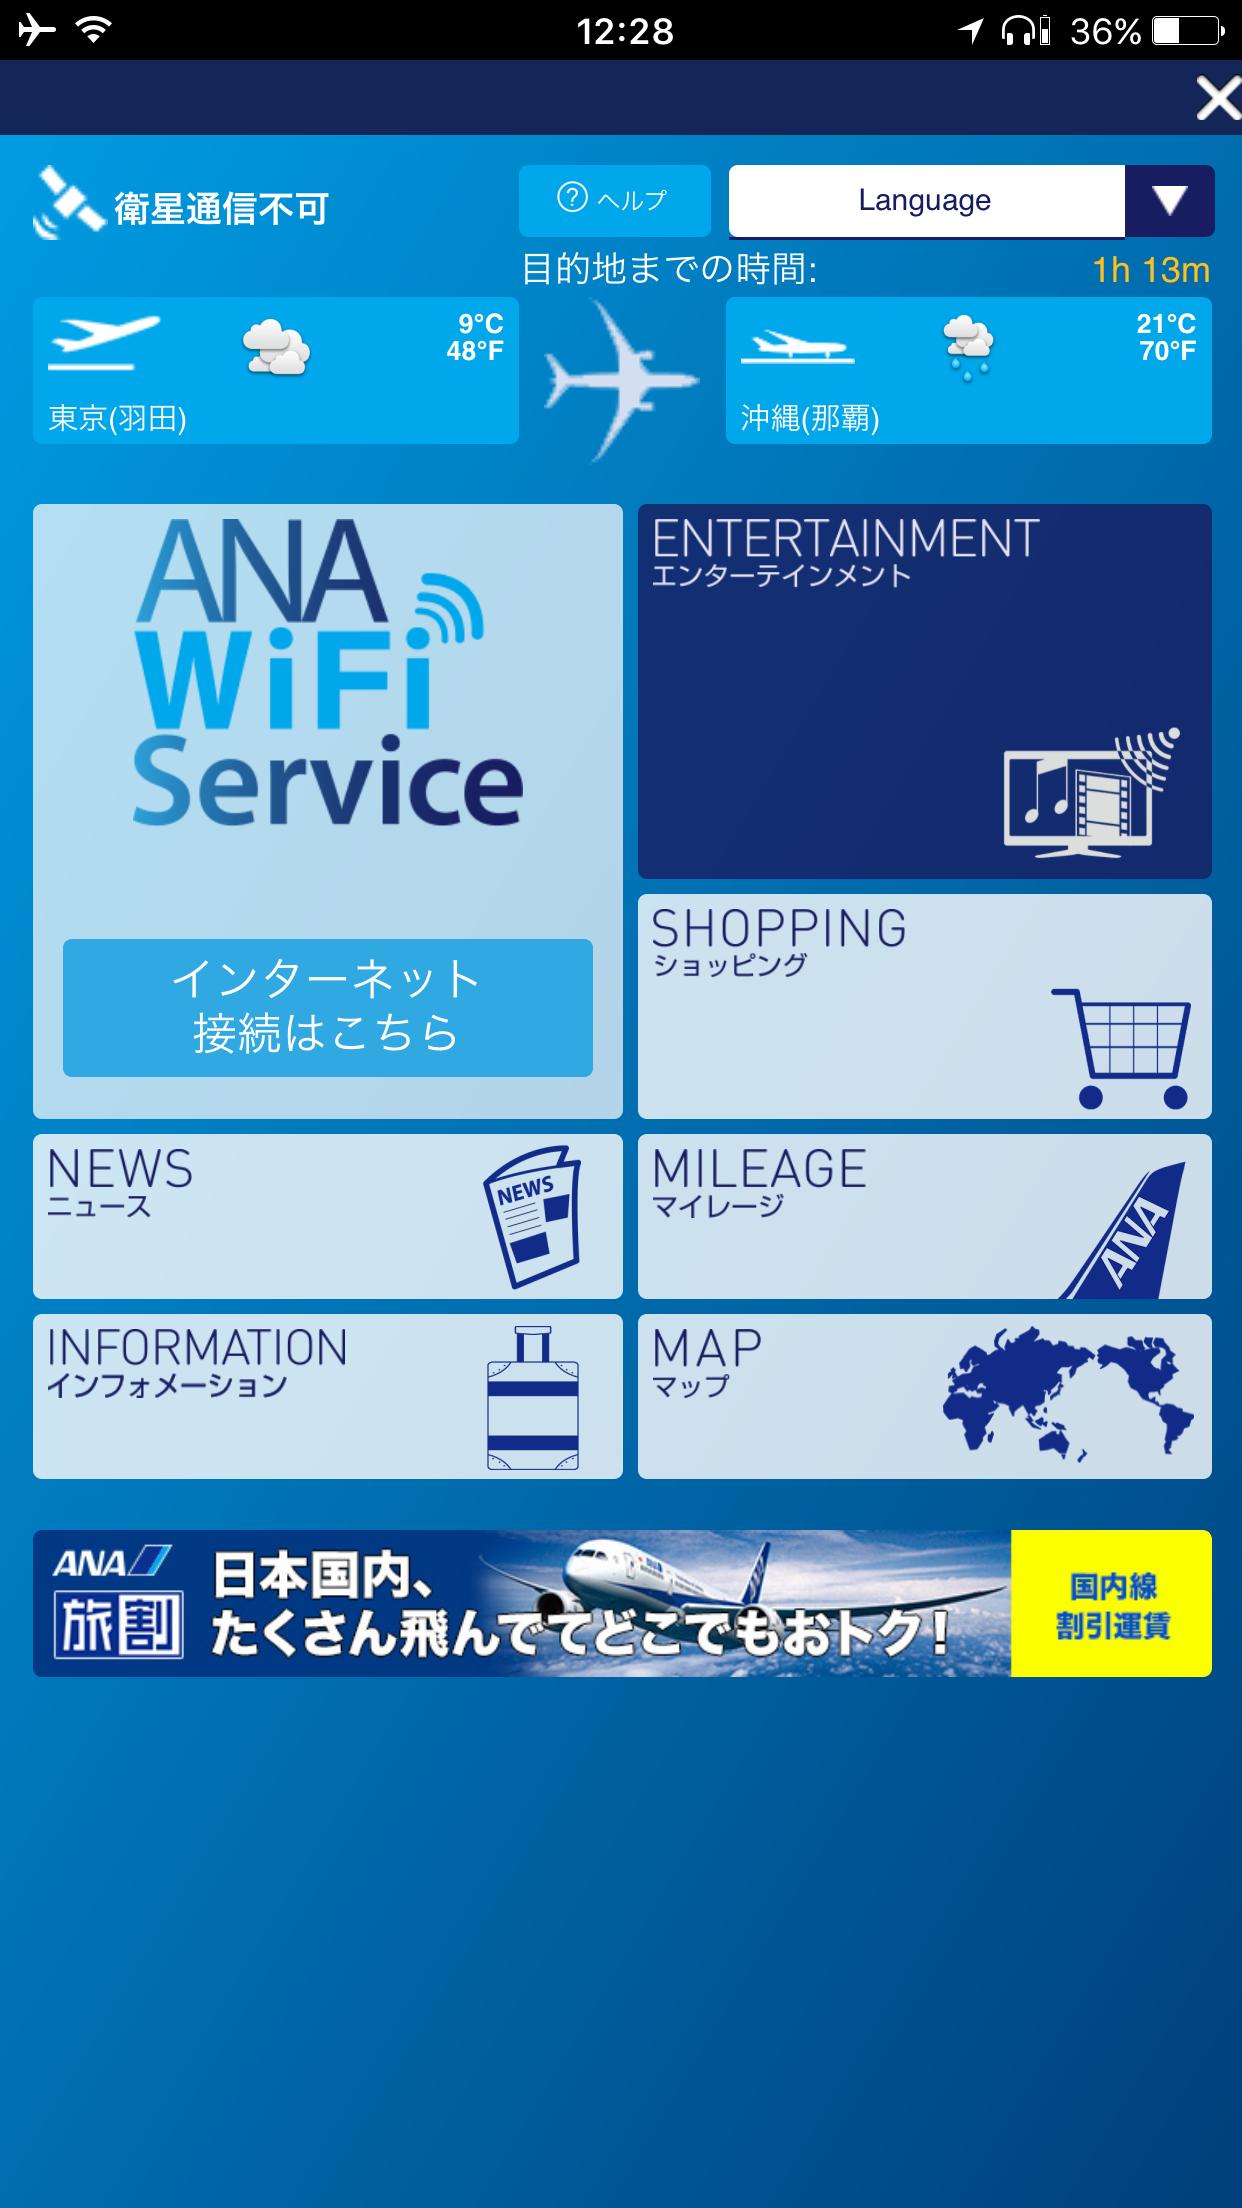 ANA国内線の機内サービスANA Wi-Fi Serviceをご紹介!無料で多彩な番組を見放題!